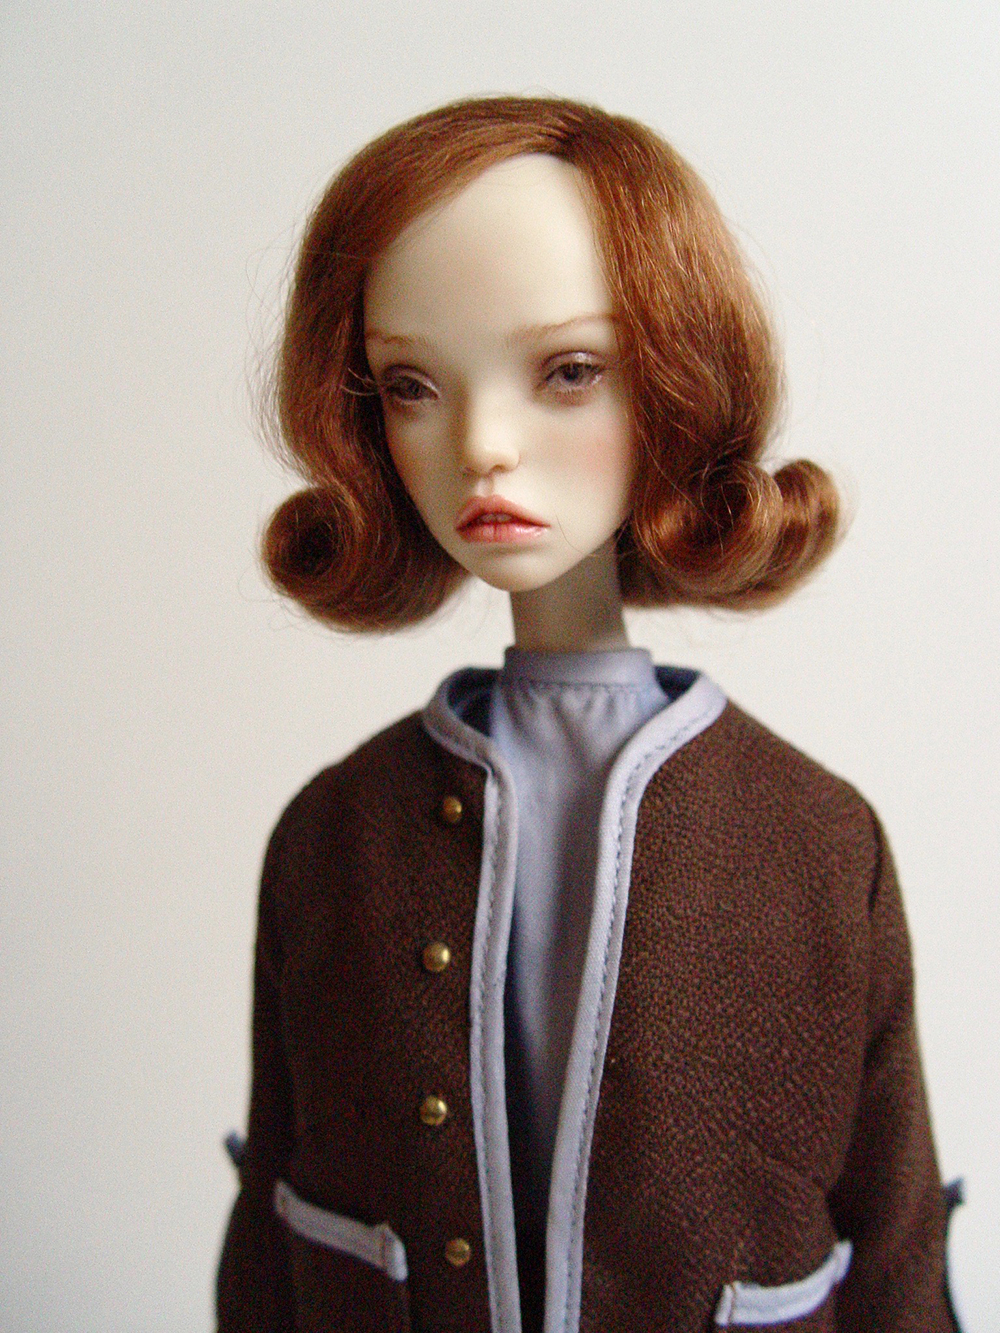 popovy queen's gambit anya taylor joy netflix beth harmon pasha bjd wig alpaca mohair marmite sue enchanted doll tender creation yatabazah